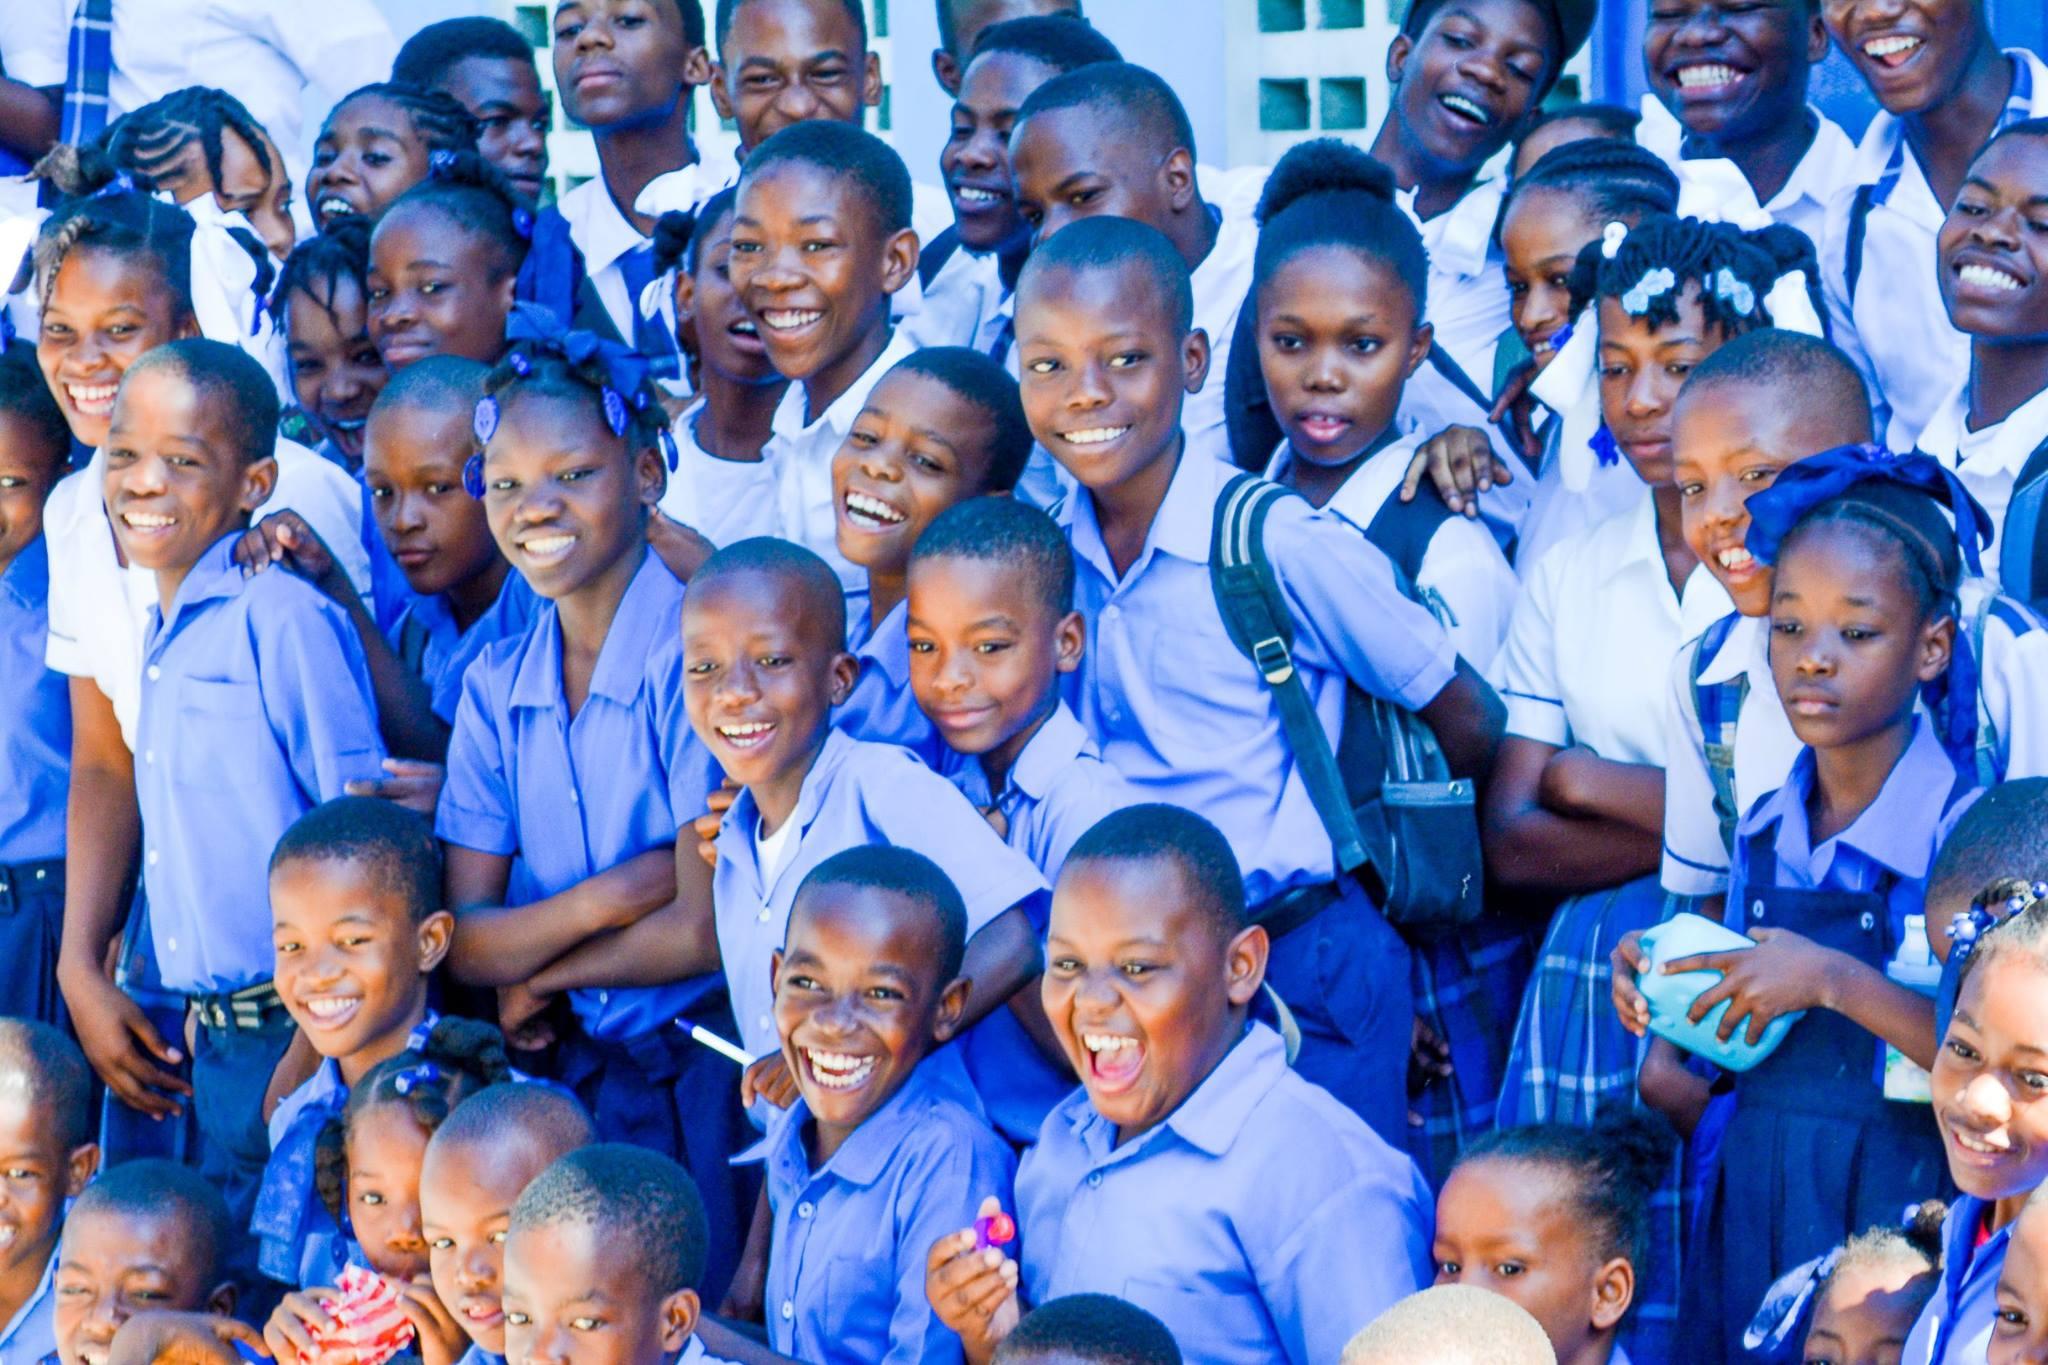 Laughing boys in Haiti.